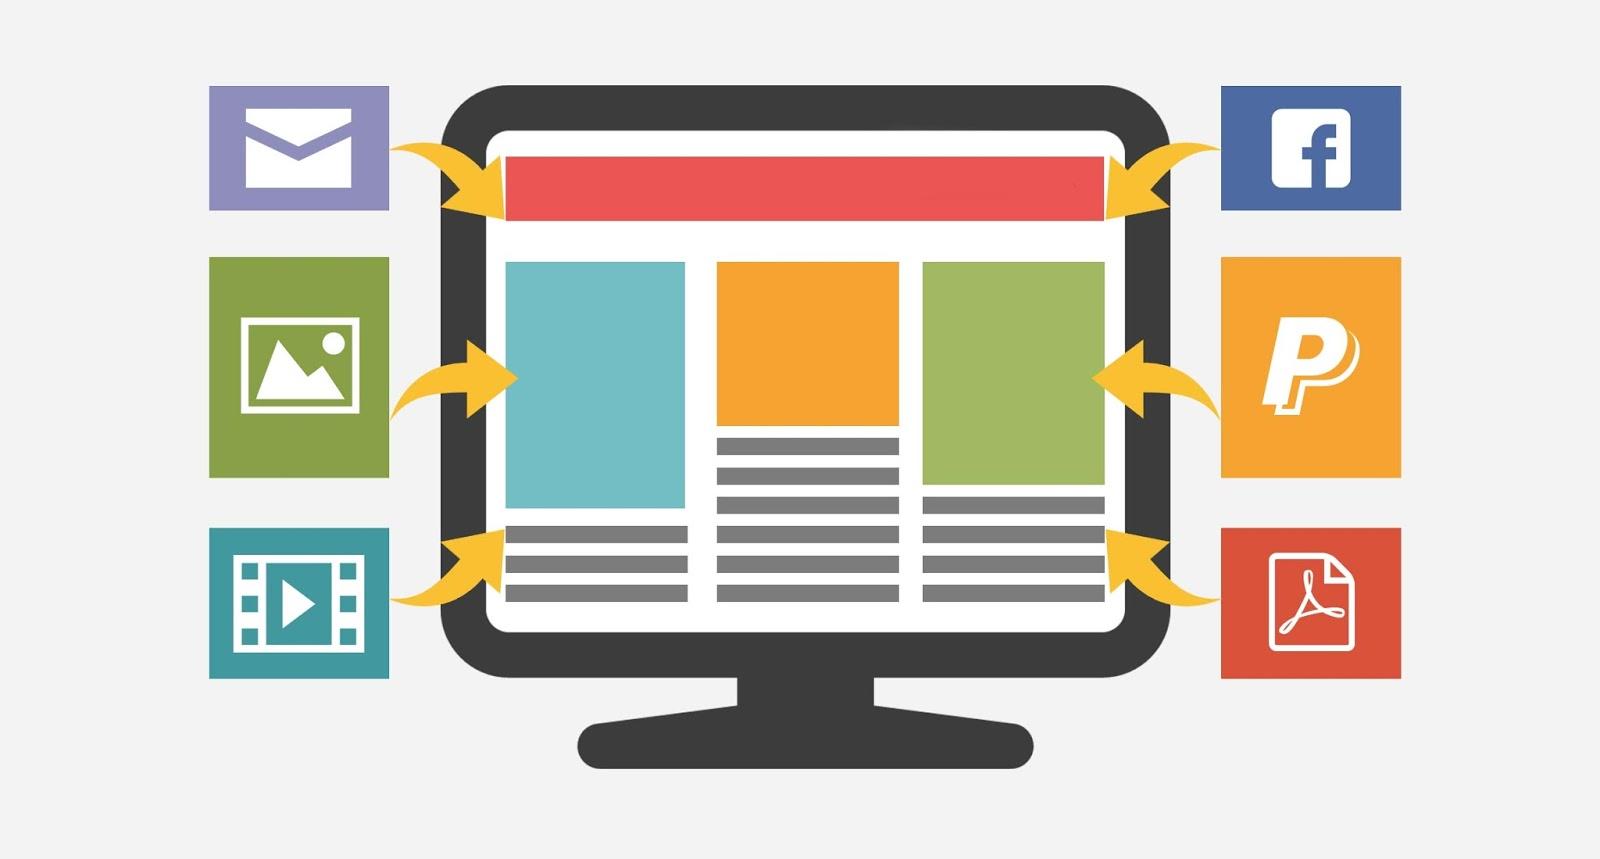 7 Langkah Membuat Aplikasi Berbasis Web